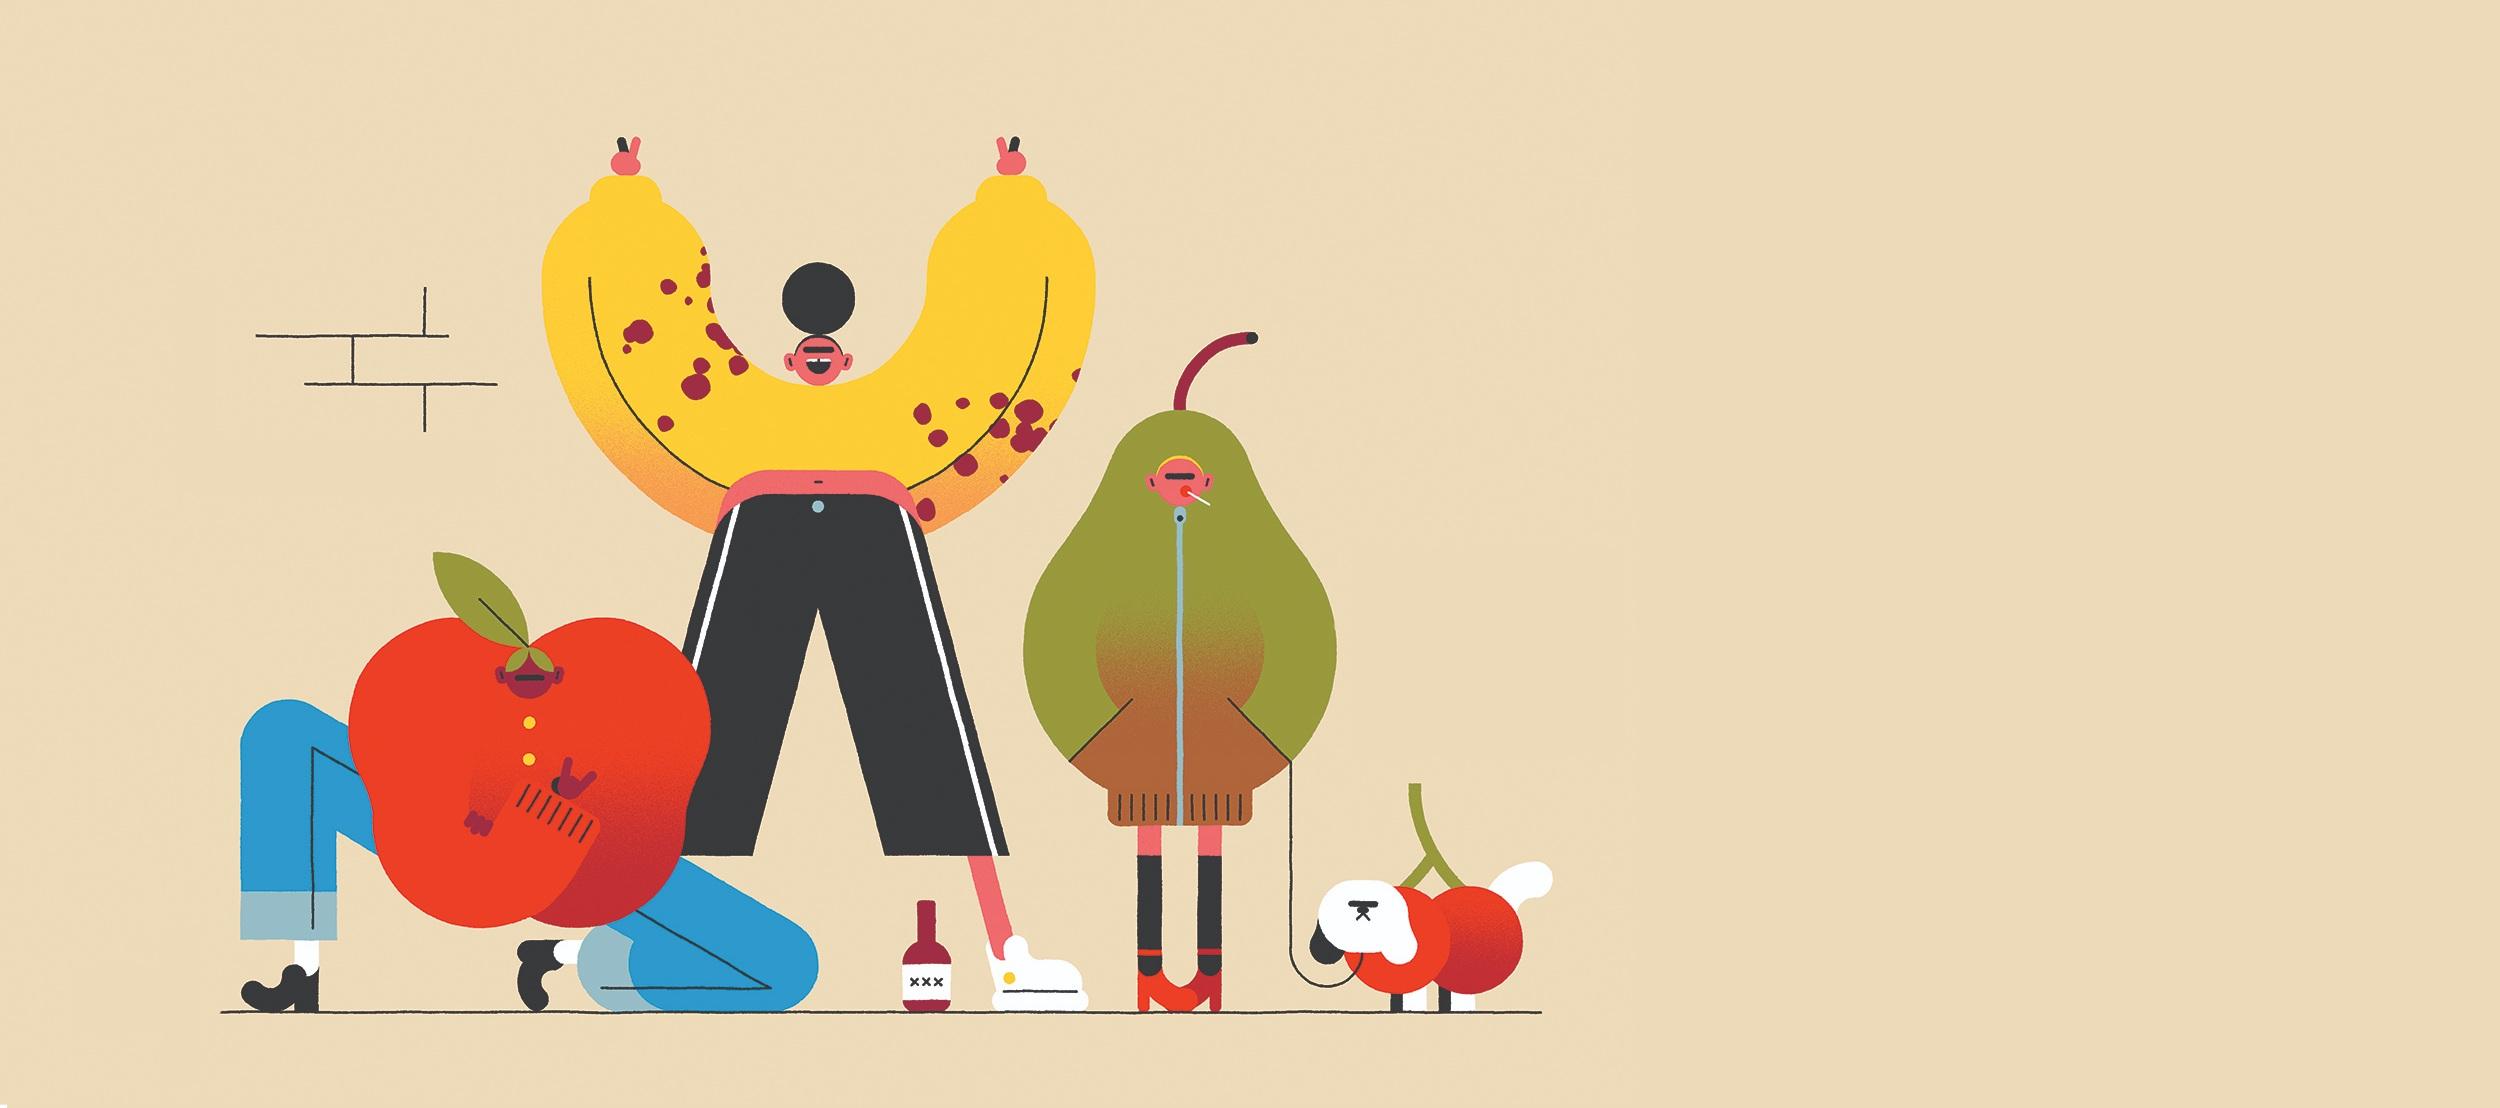 Obst & Gemüse - Group showOpening 18/6